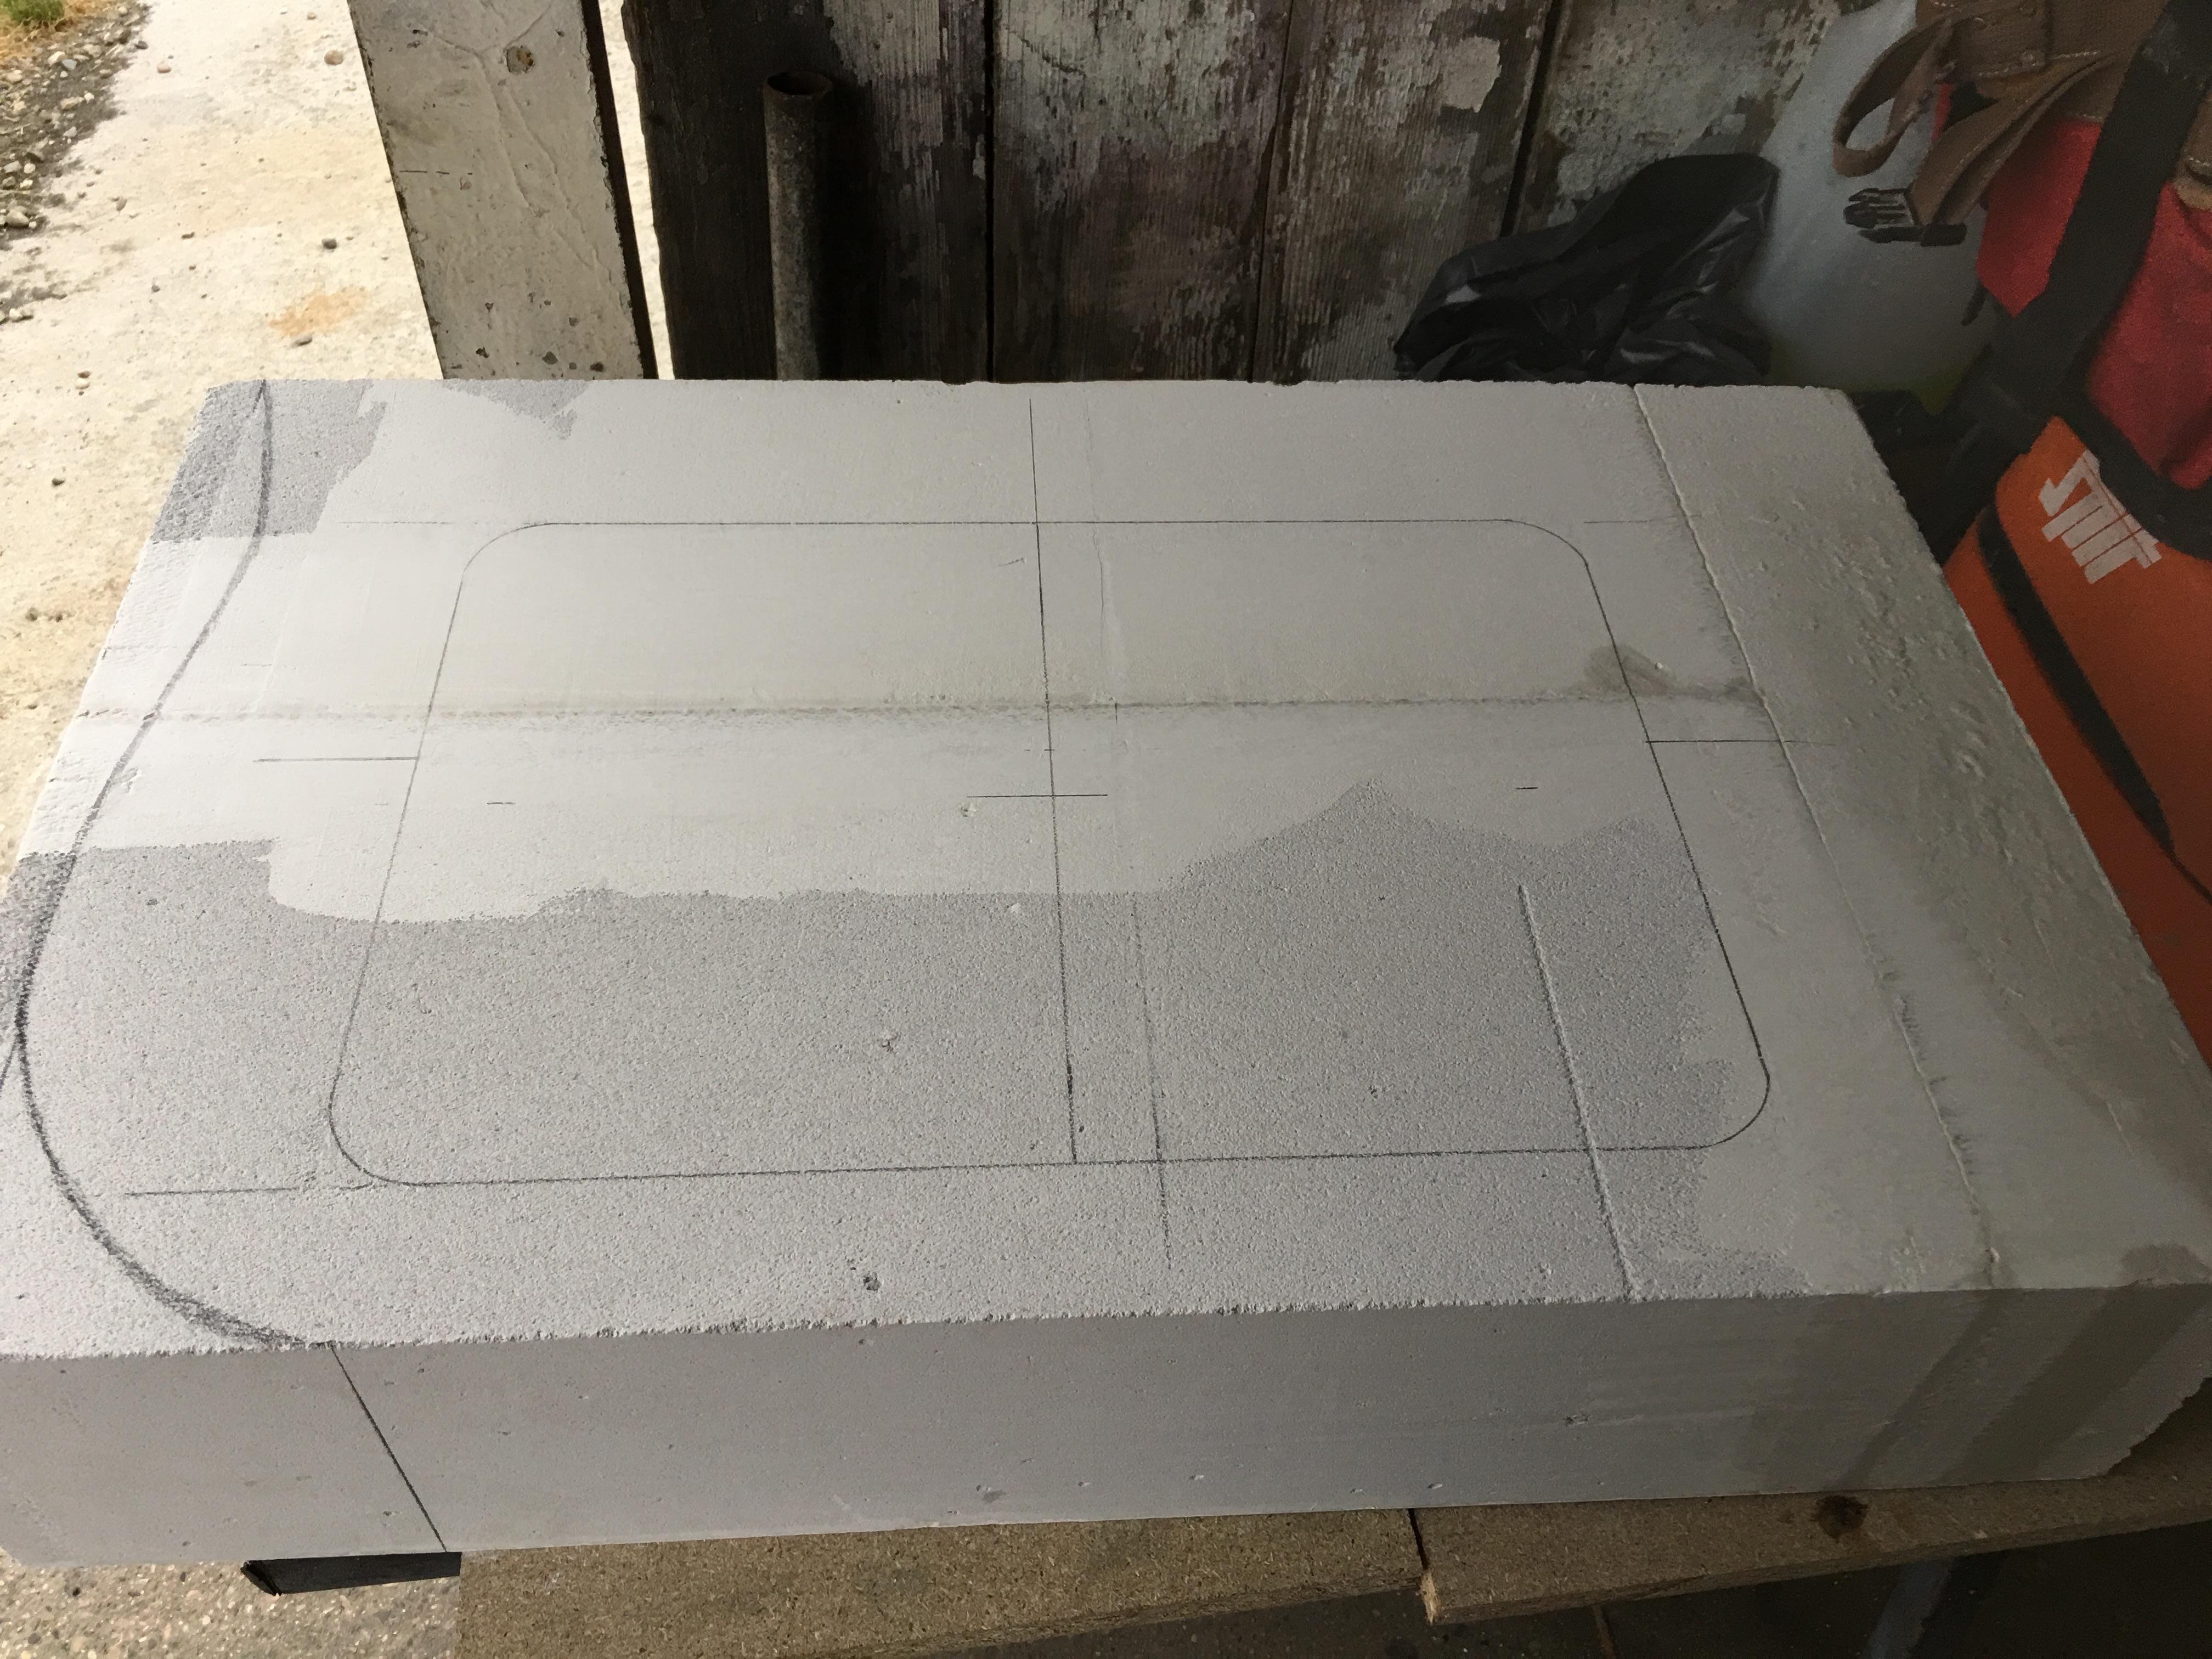 lavabo salle de bain beton ciré avant